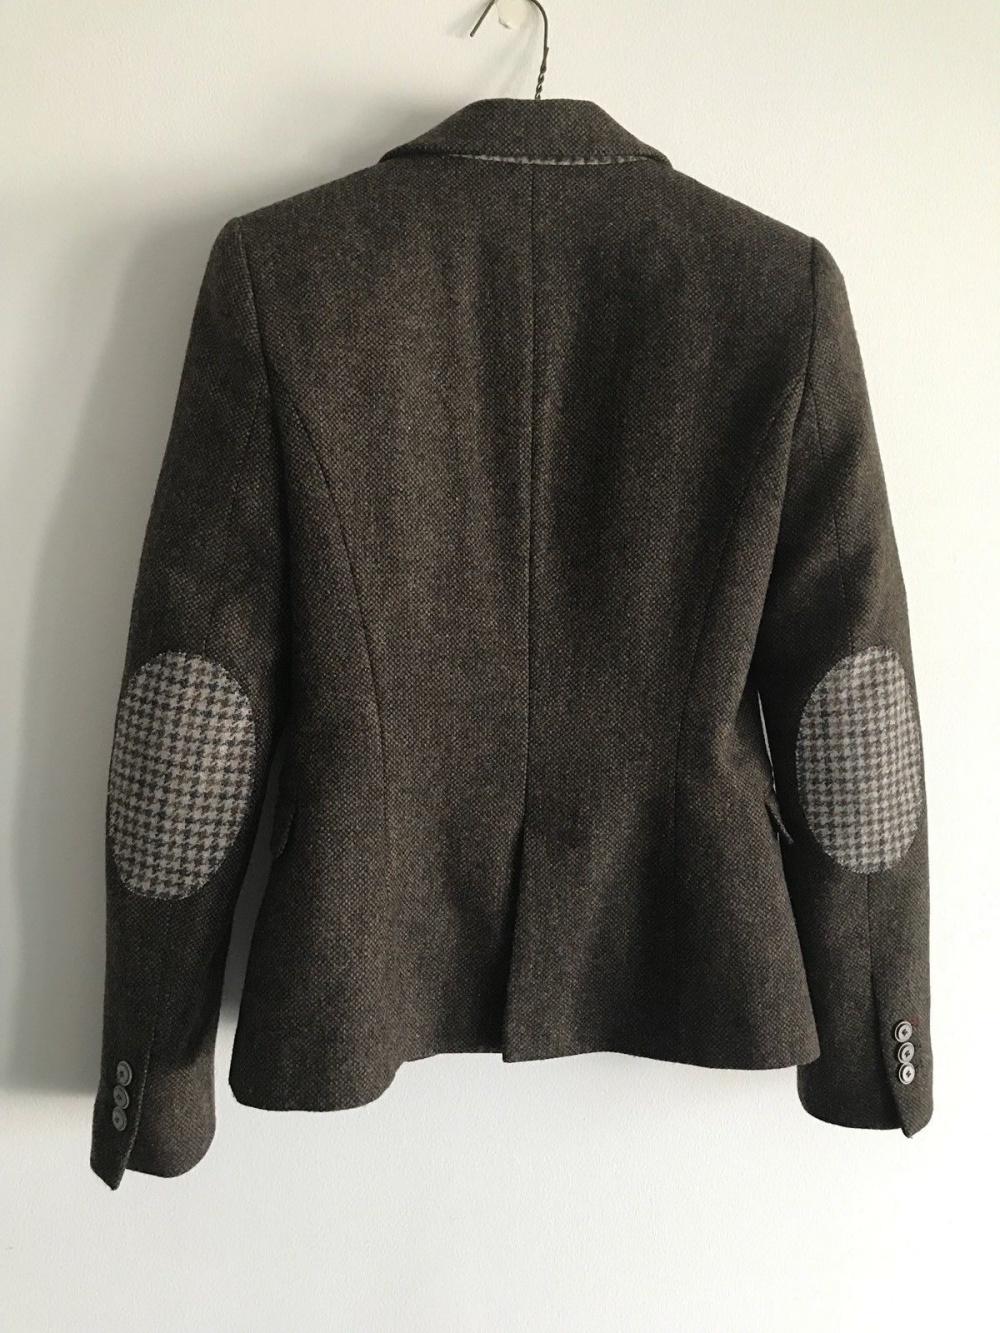 Zara Basic, шерстяной жакет, S